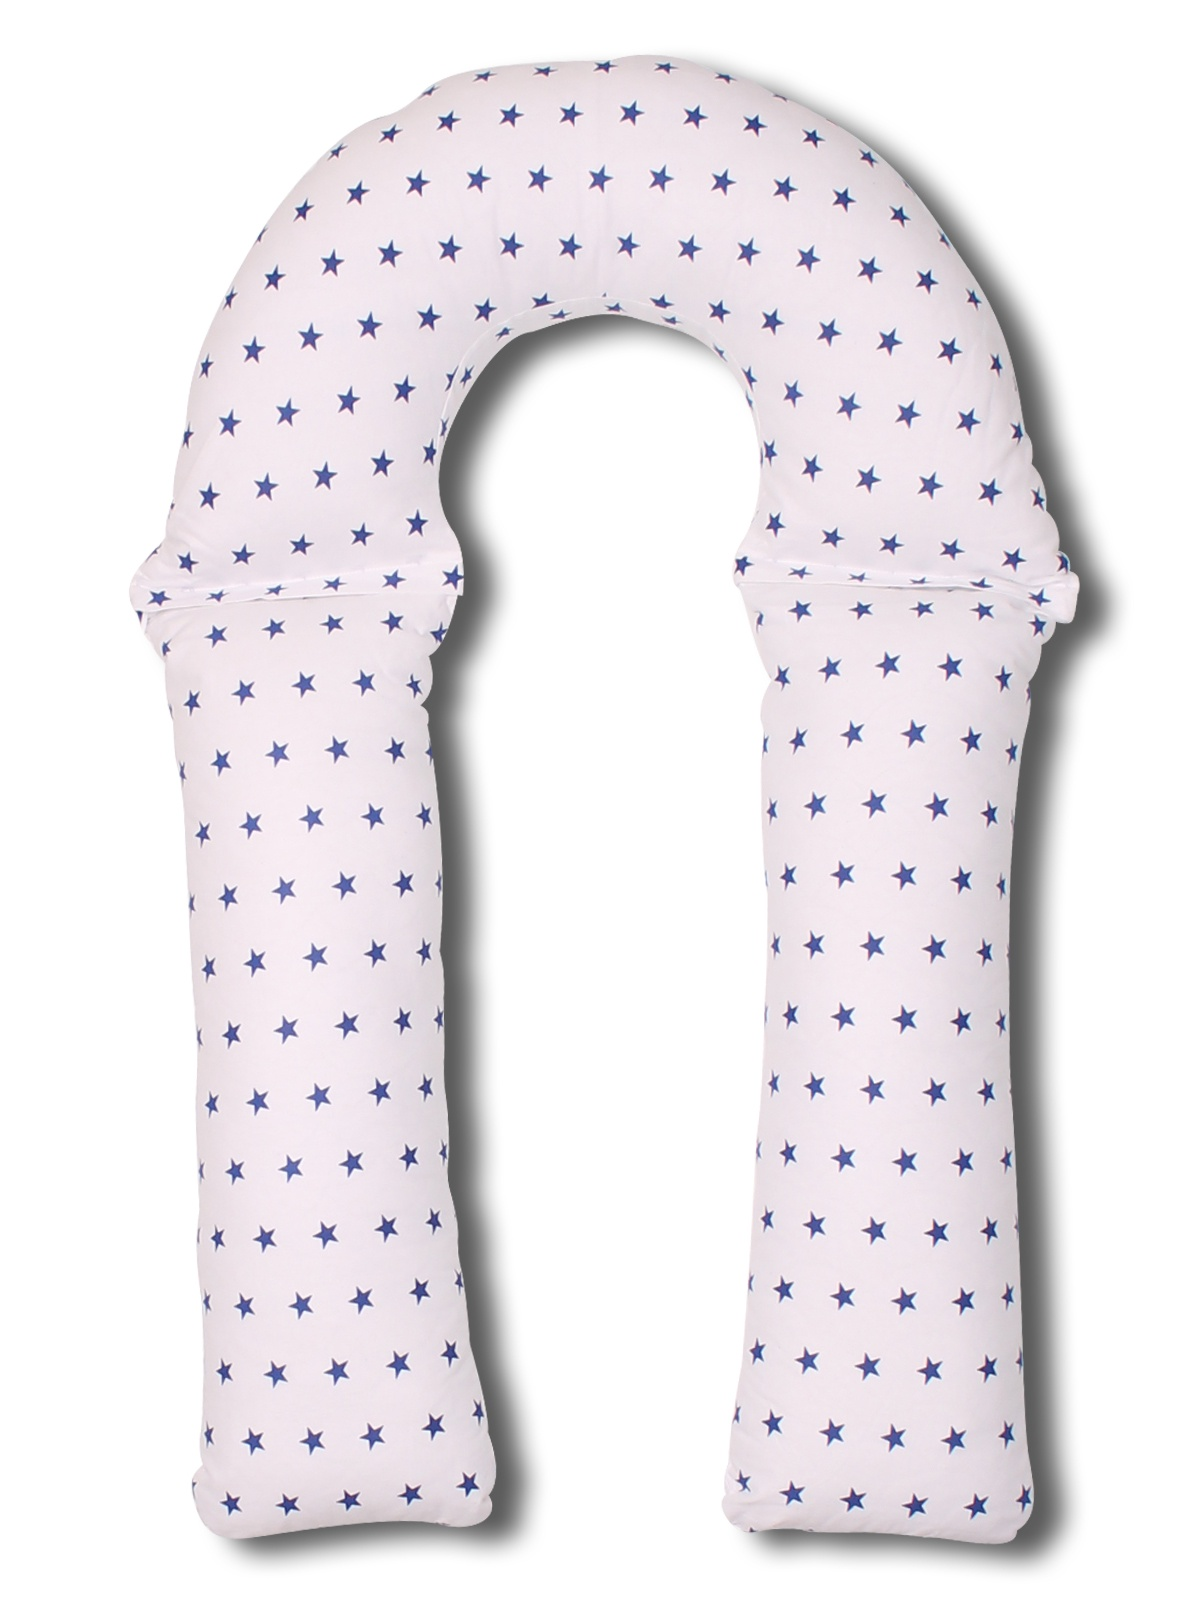 Подушка Т90х150 холлофайбер + наволочка бело-синие звезды